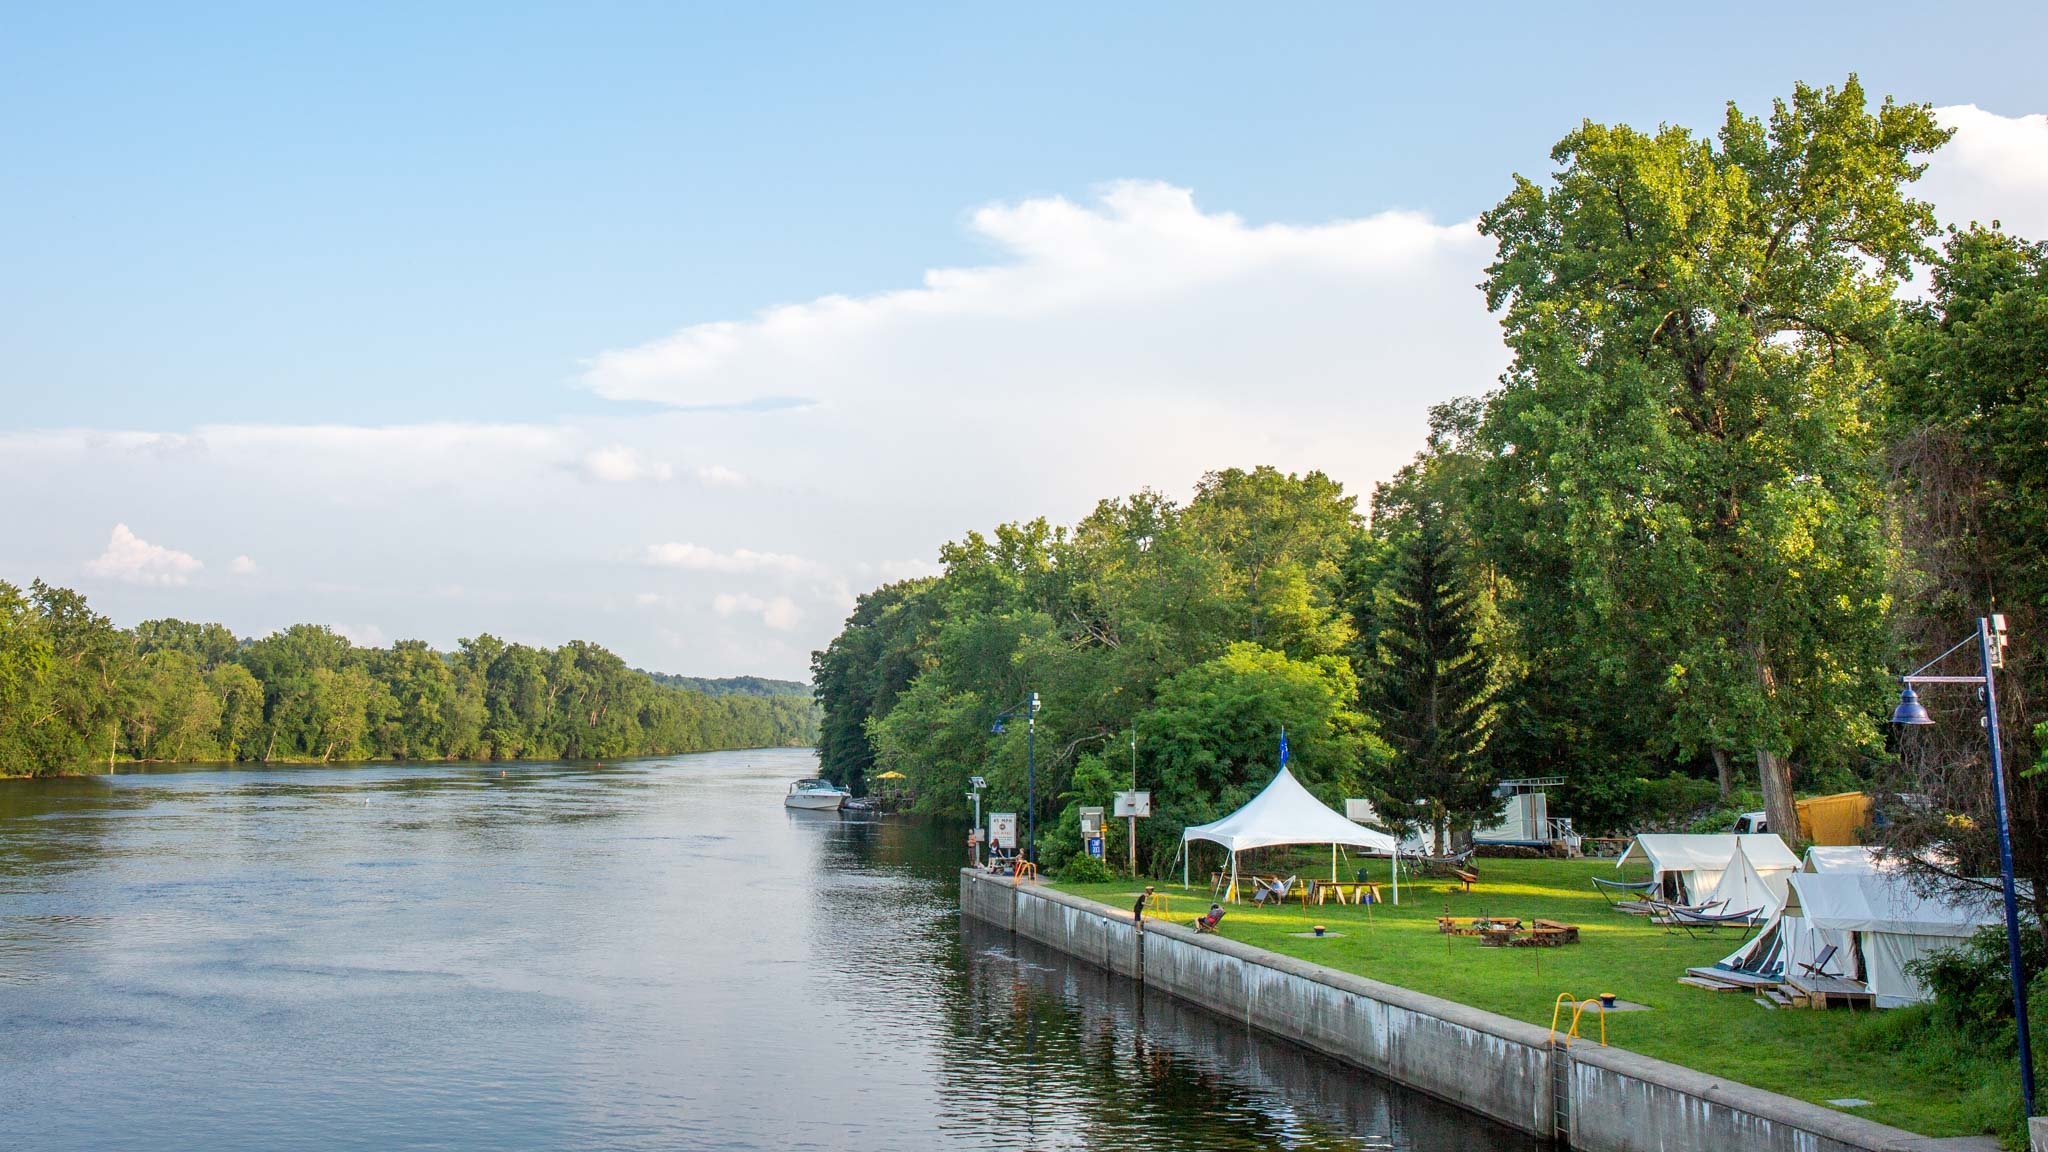 Events in Saratoga Springs September 2021